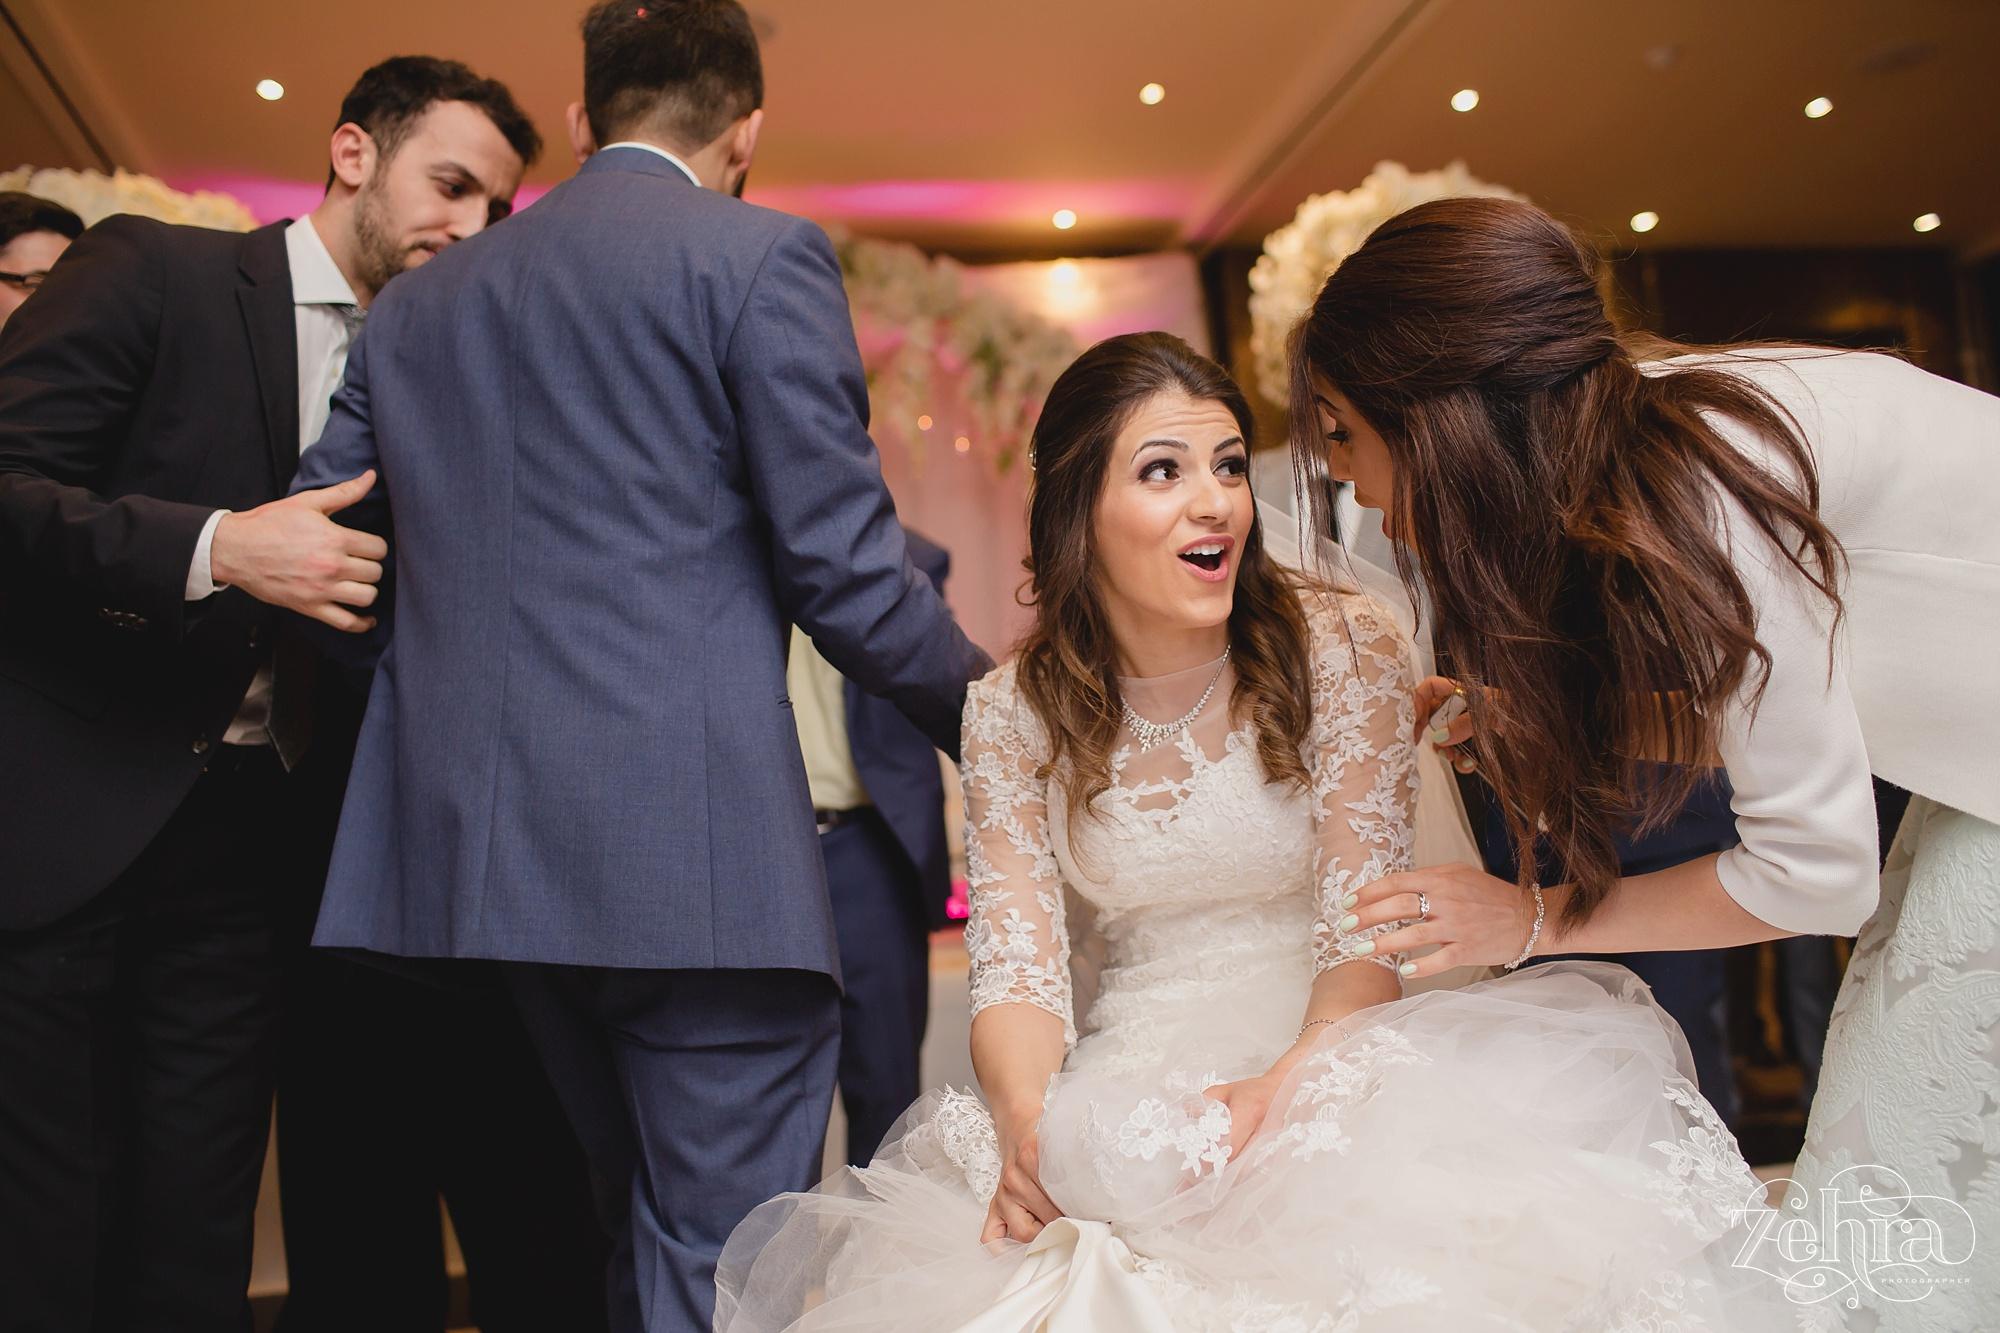 zehra photographer mere cheshire wedding_0039.jpg